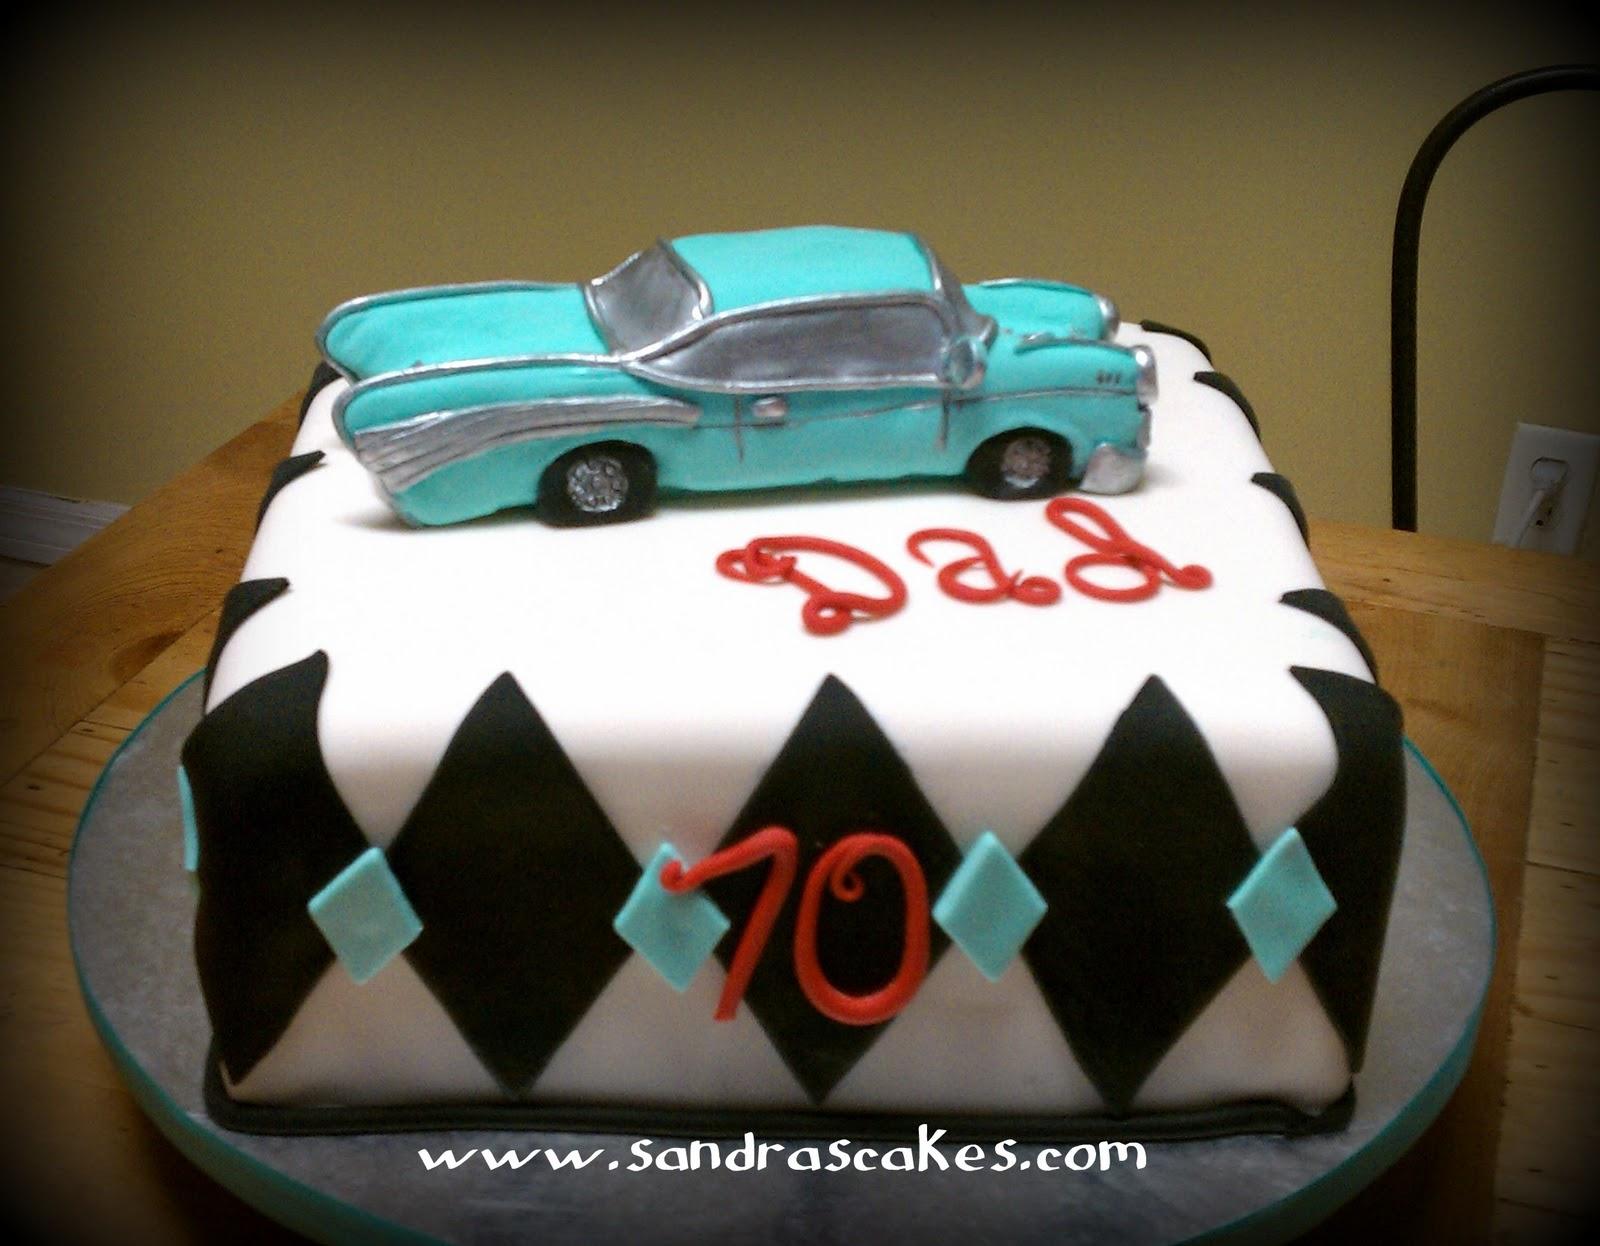 Sandras Cakes Unique Birthday Cakes Classic Car Cake For A